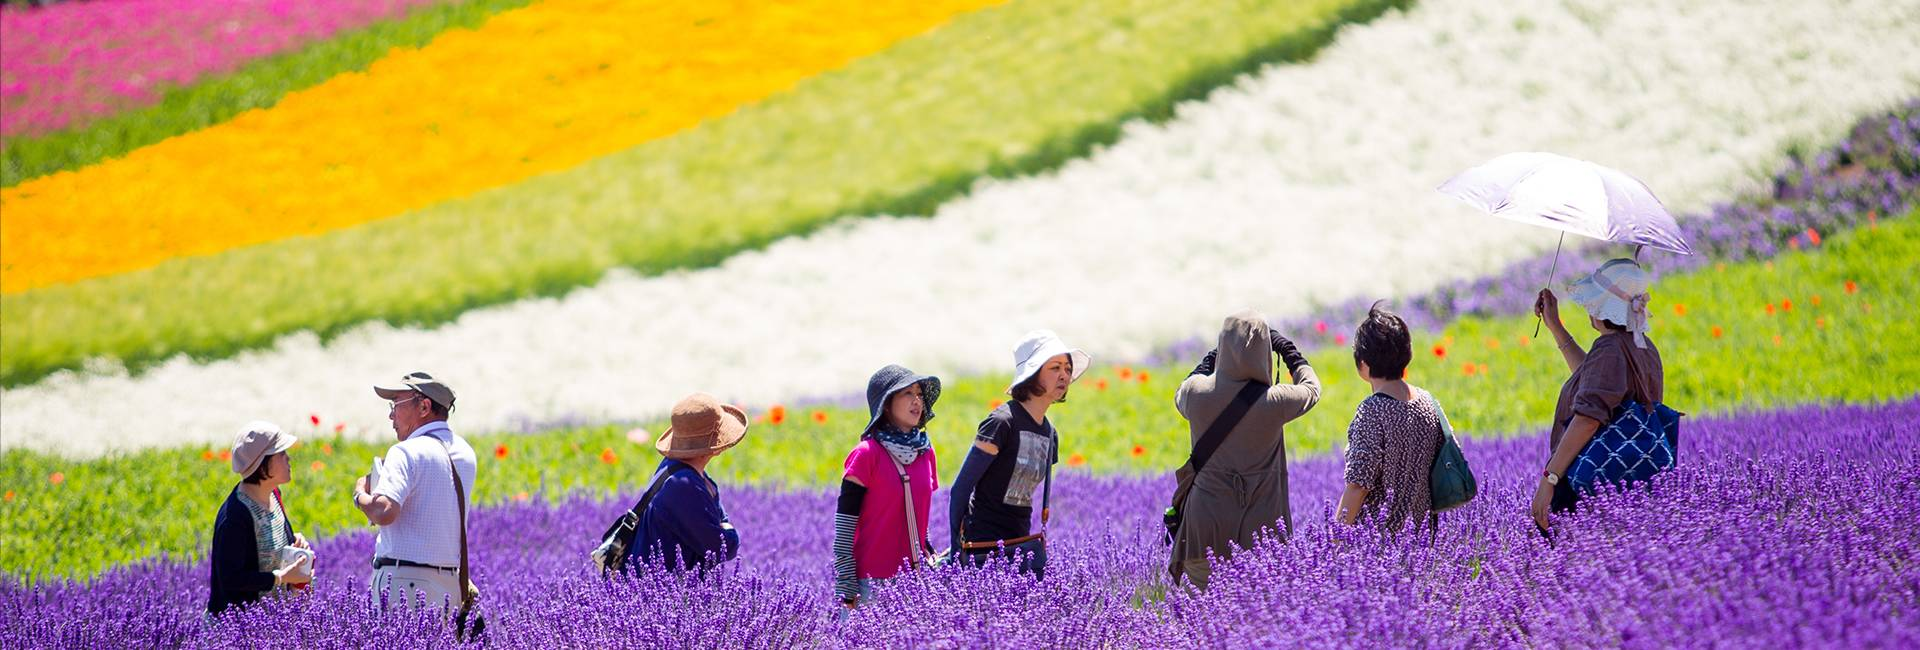 Passeggiata Furano